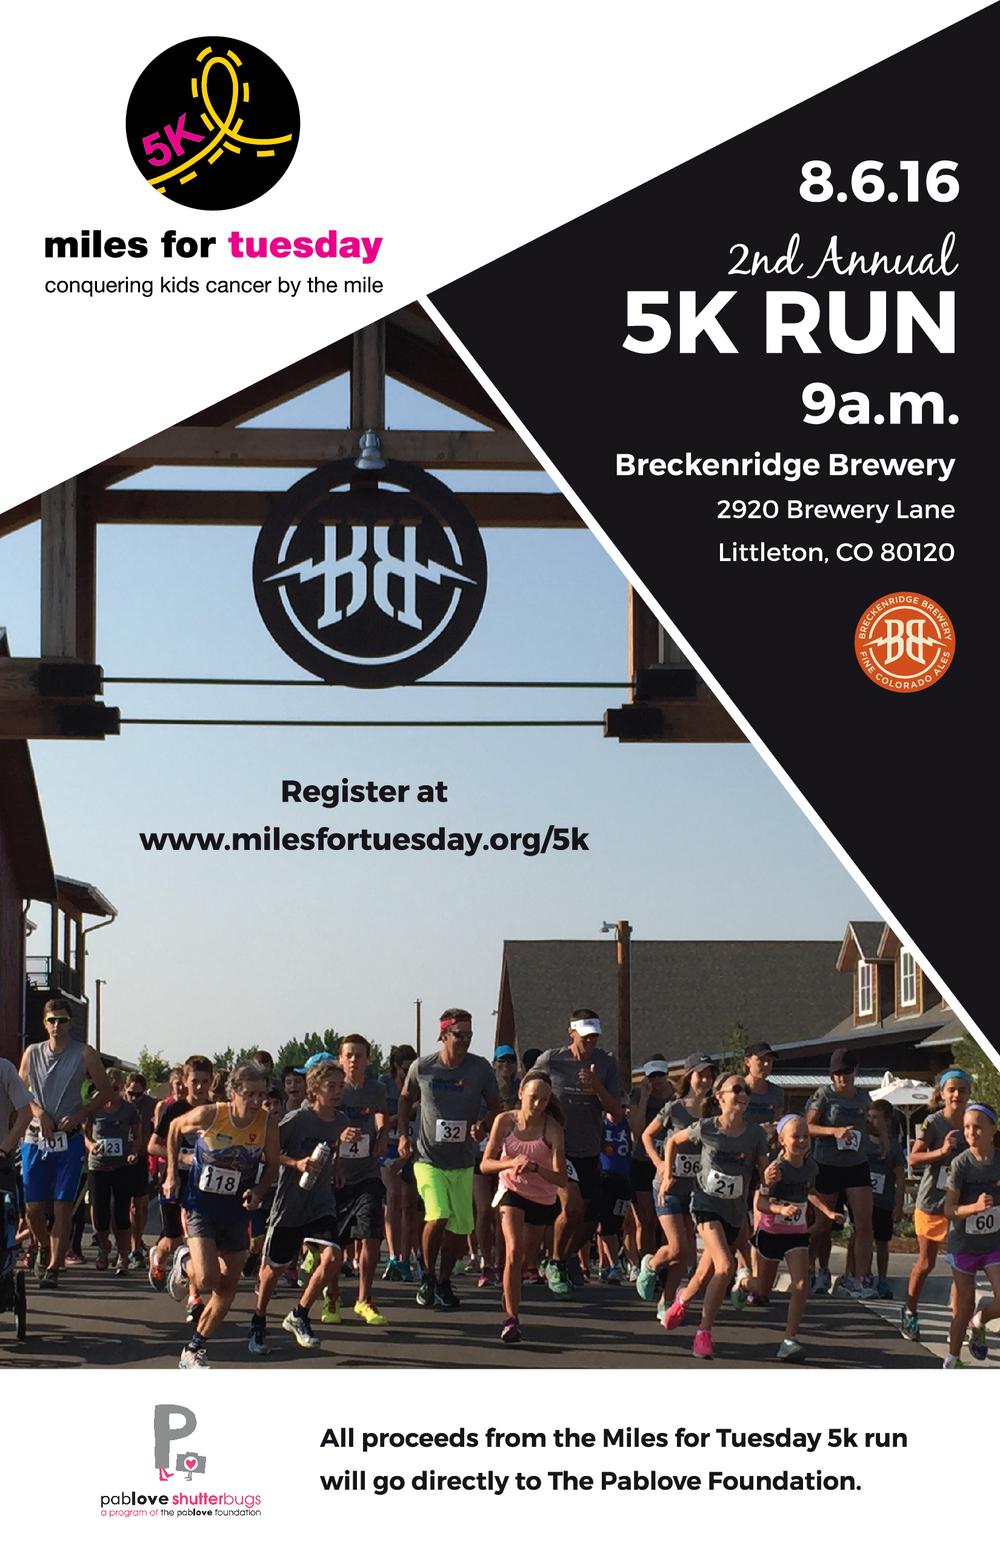 Miles for Tuesday 5k - race flyer.jpg